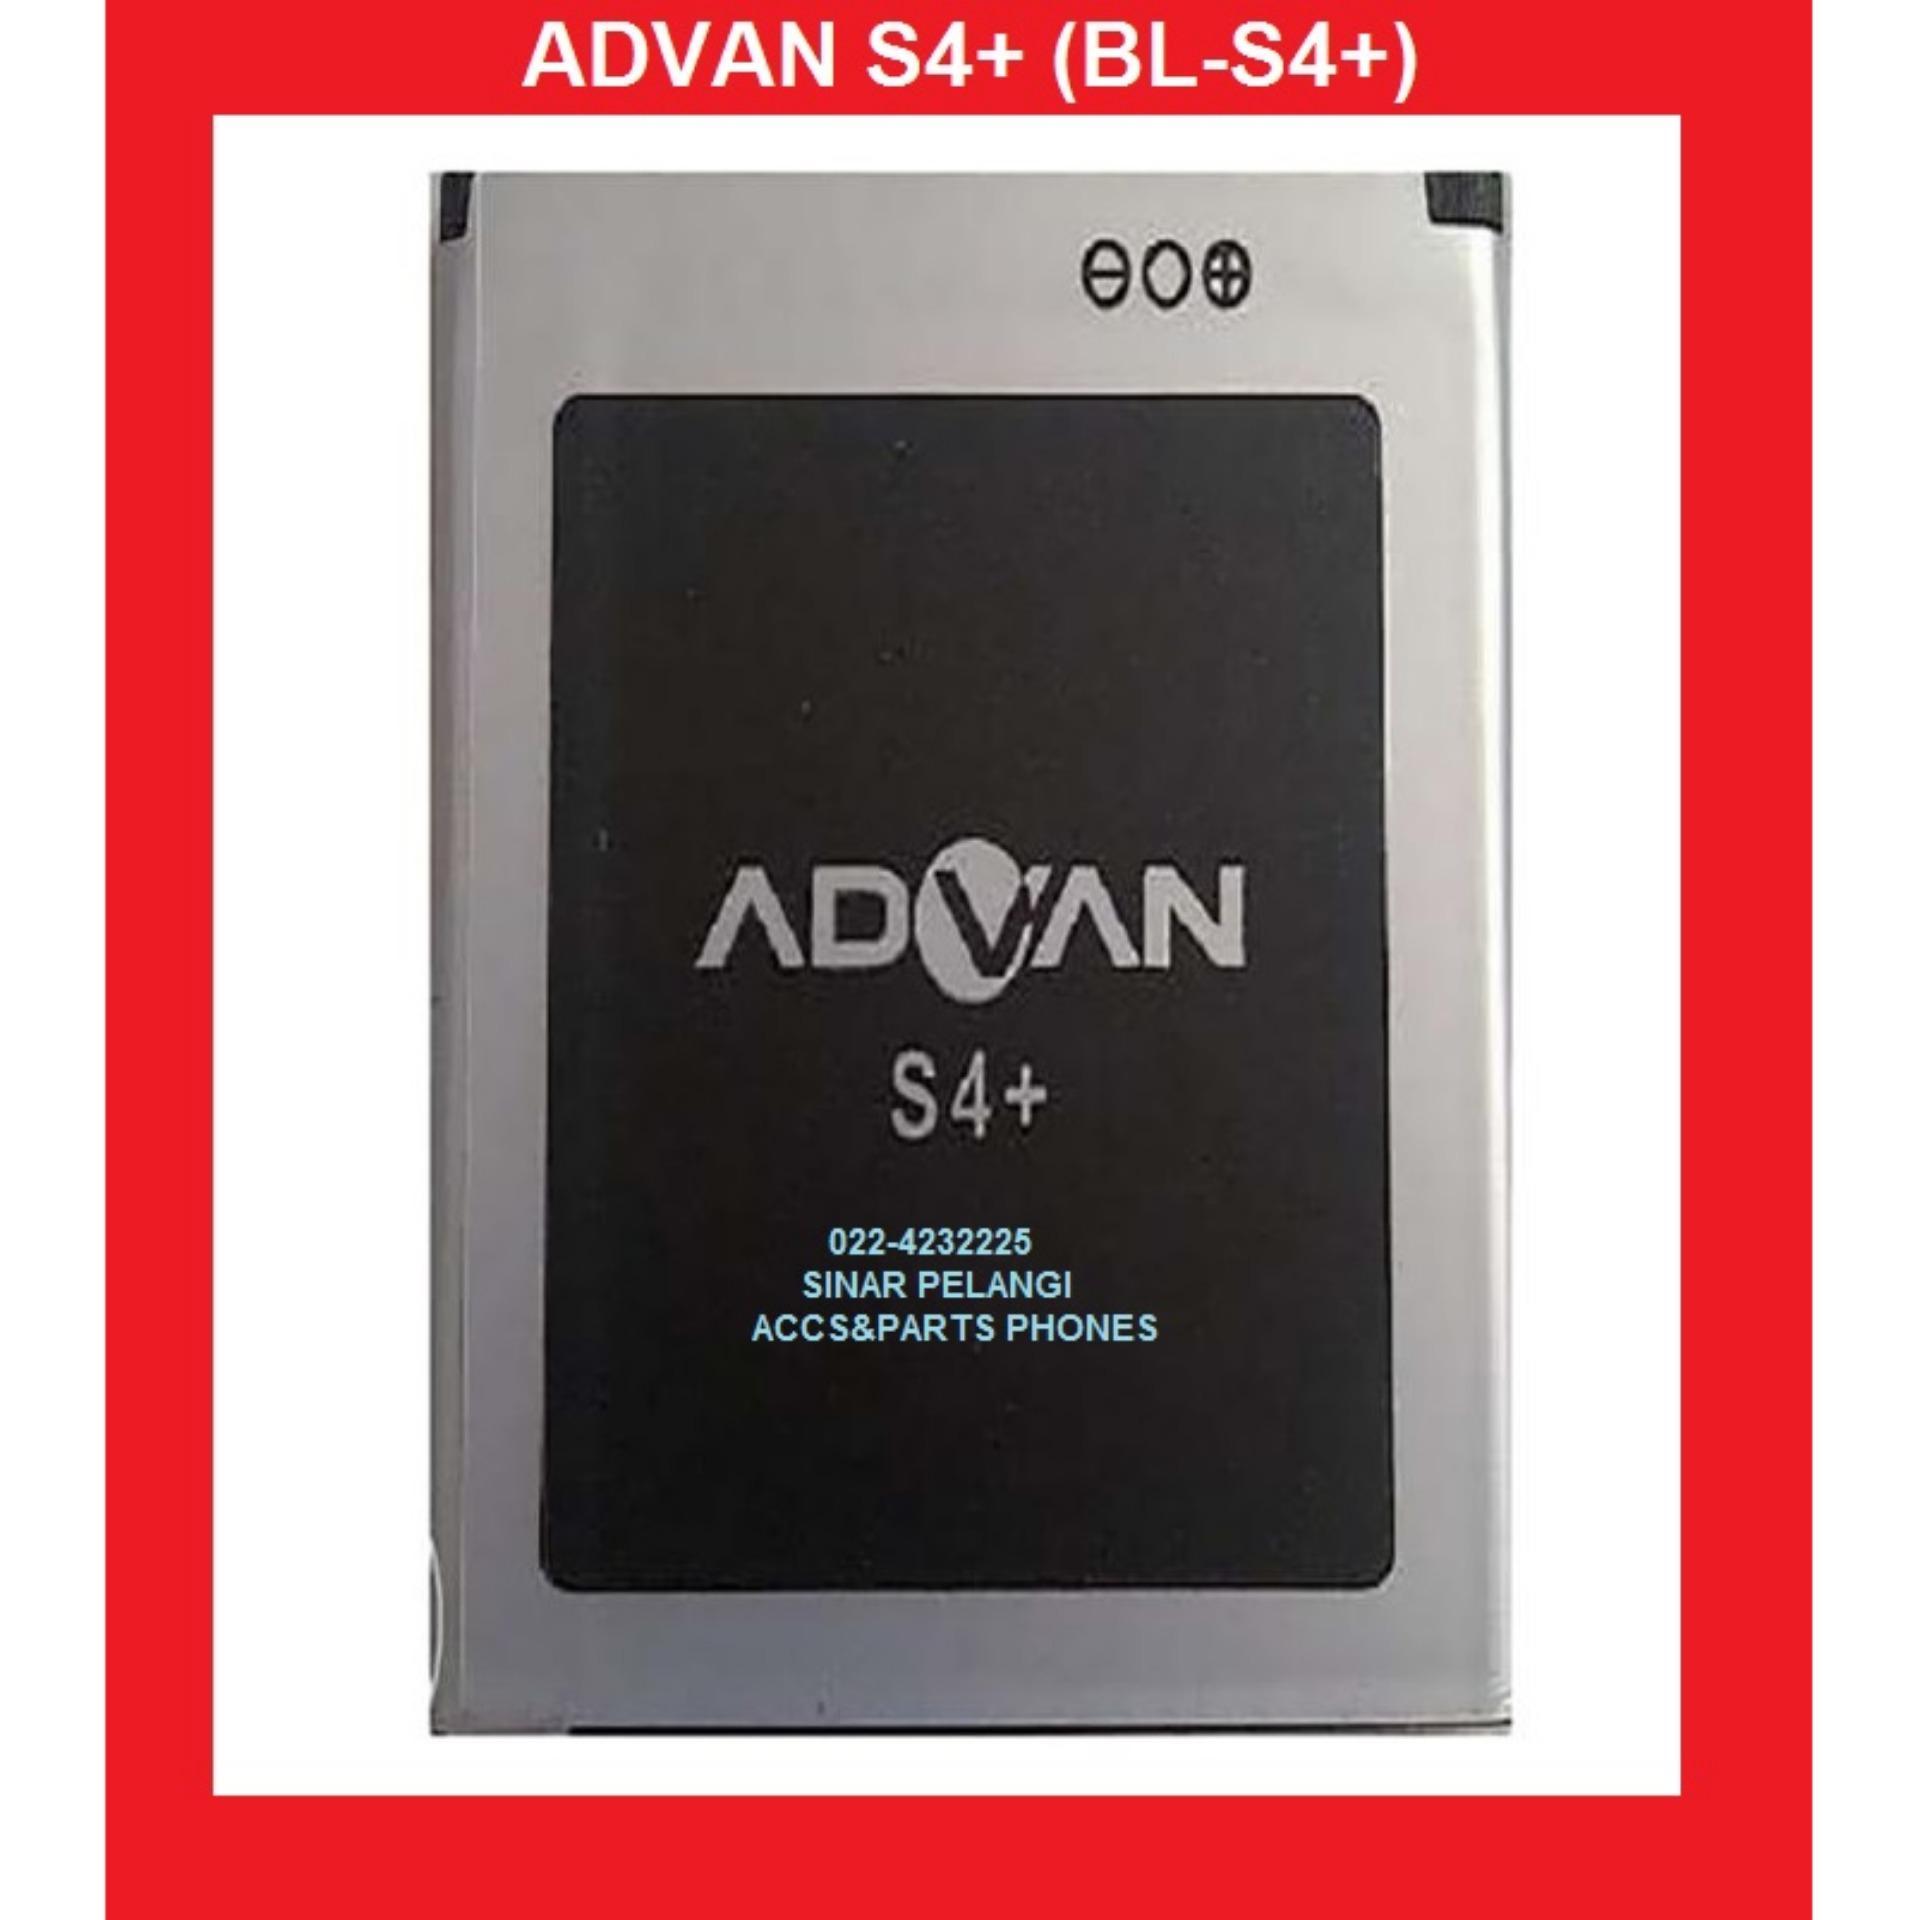 Beli Batre Advan S4 Store Marwanto606 S4z Baterai 1300mah Battery Replacement Batu Pengganti 902586